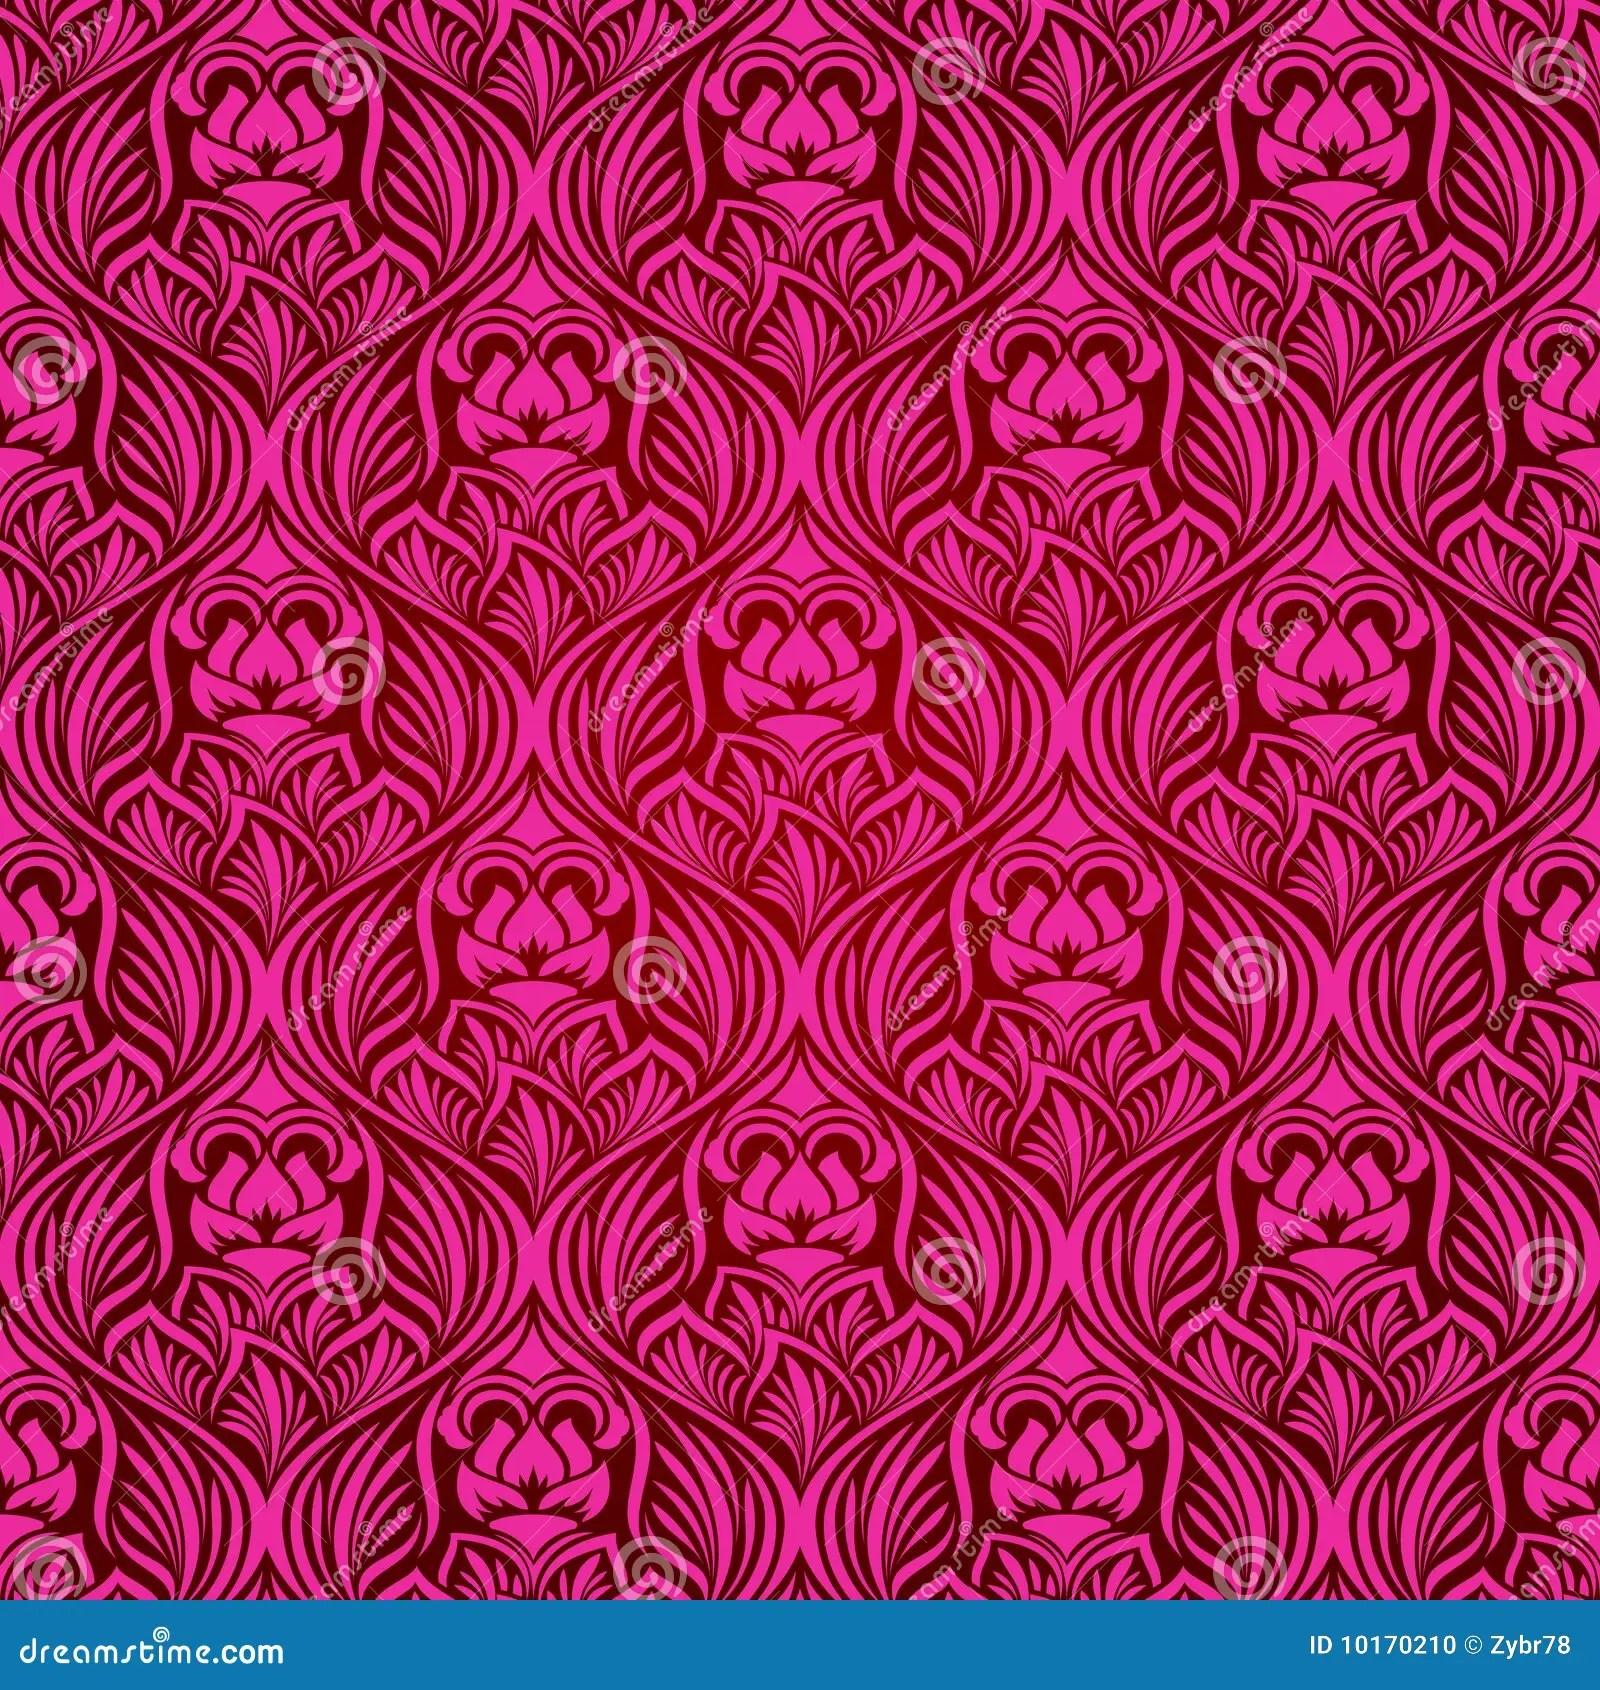 Pink Animal Print Wallpaper Magenta Seamless Wallpaper Stock Photo Image 10170210